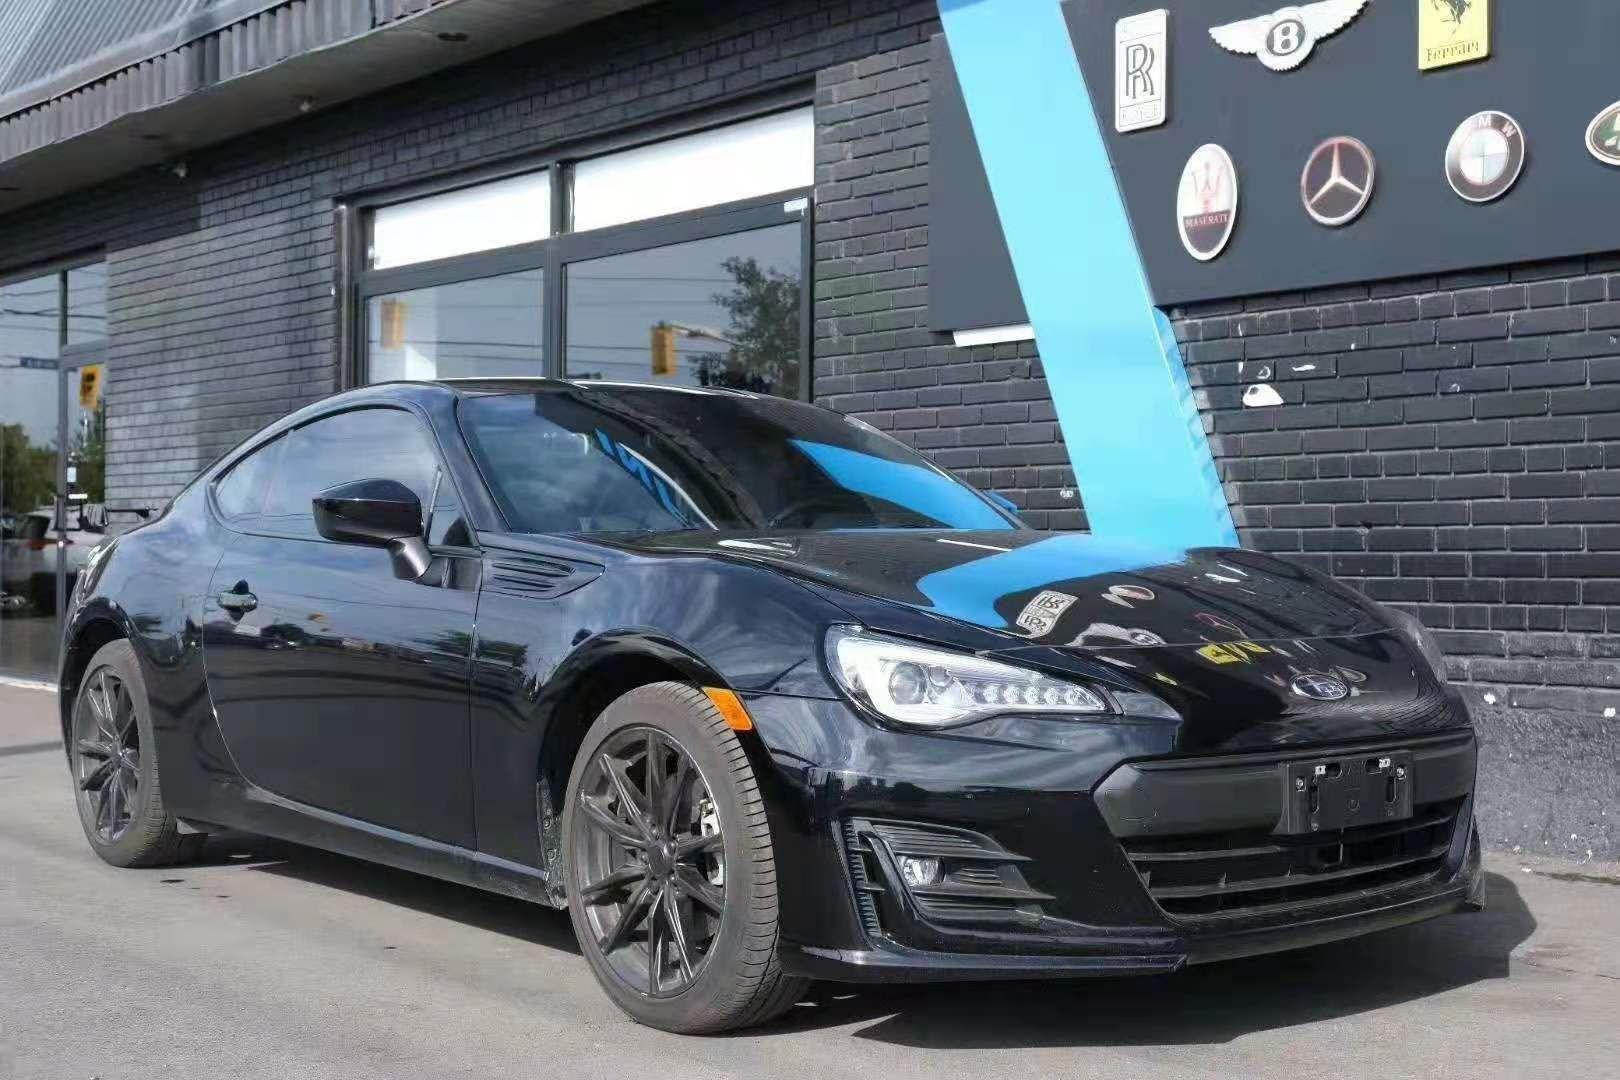 2020 Subaru BRZ BRZ SPORT TECH AT - INFOCAR - Toronto's Most Comprehensive New and Used Auto Trading Platform